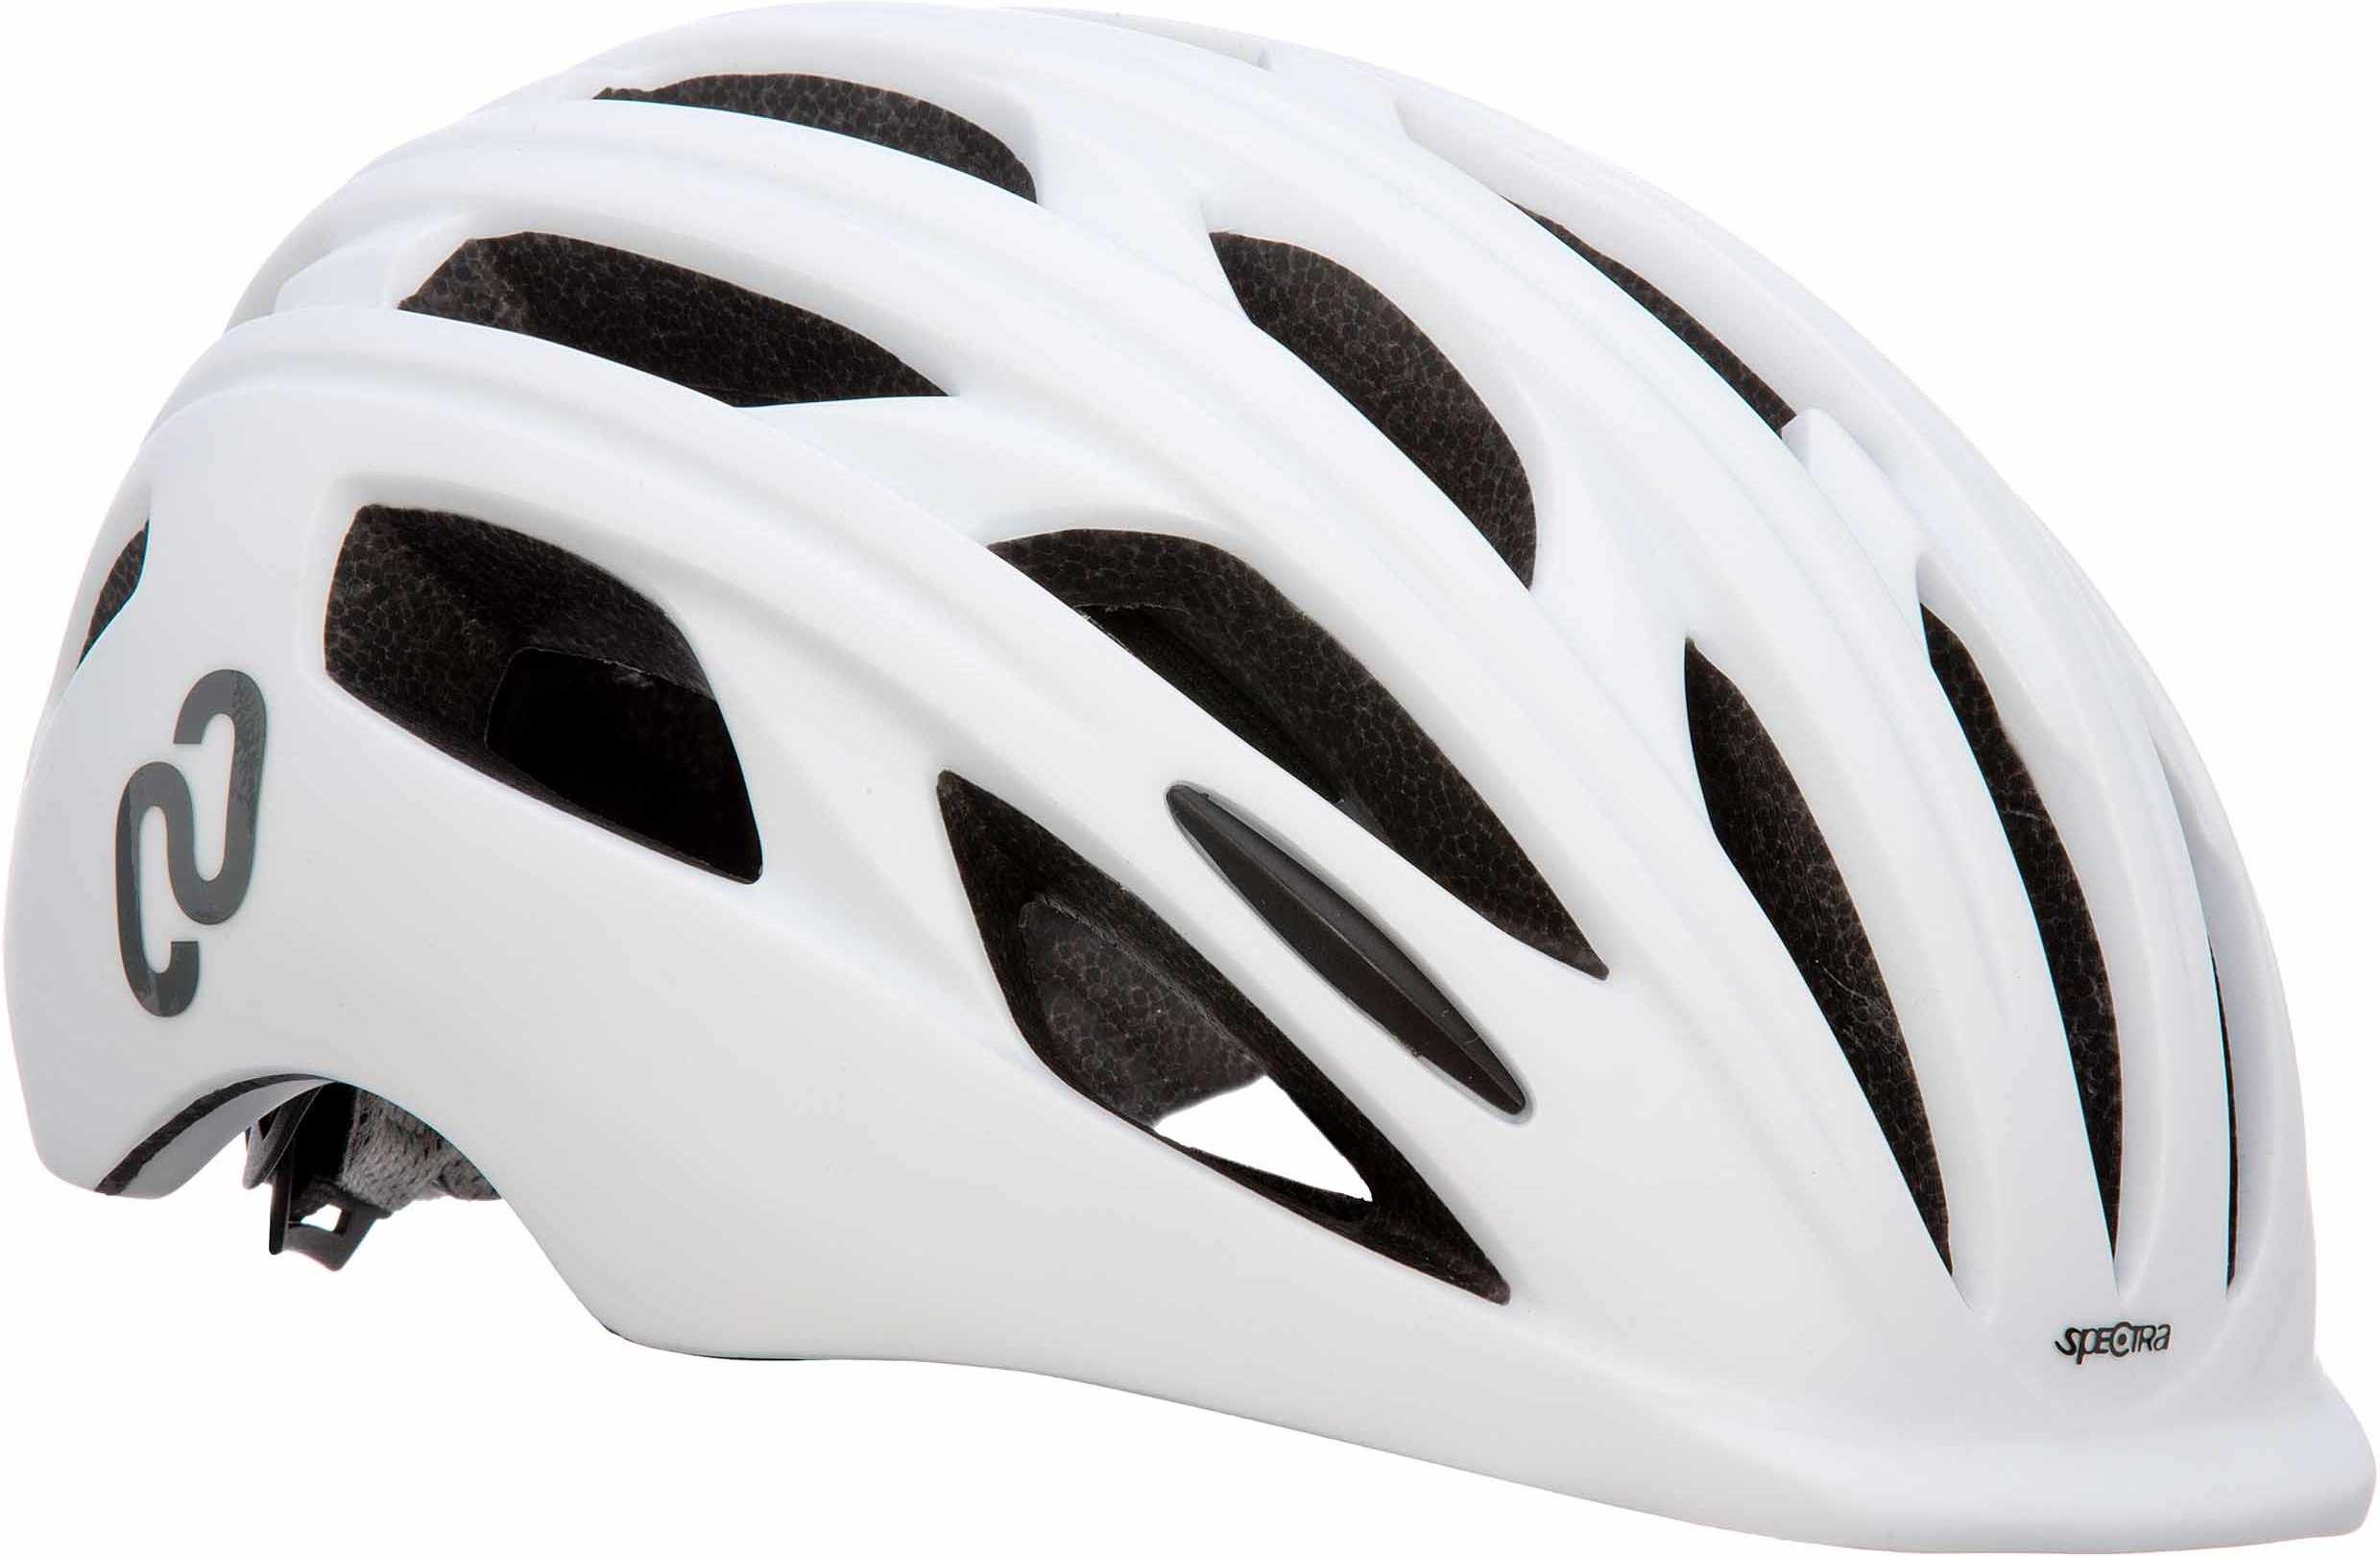 spectra cykling du kan köpa online  621615cc48b7f